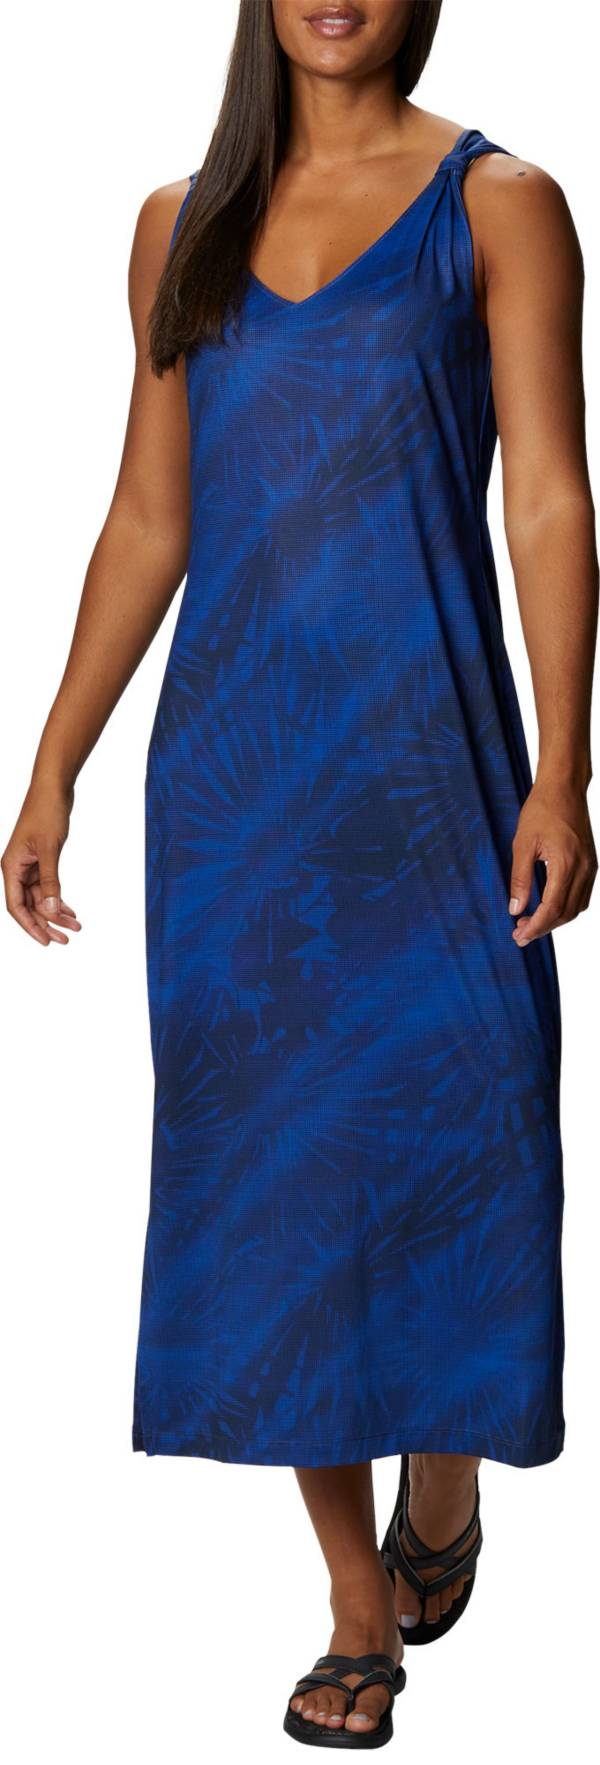 Columbia Women's Chill River Midi Dress product image